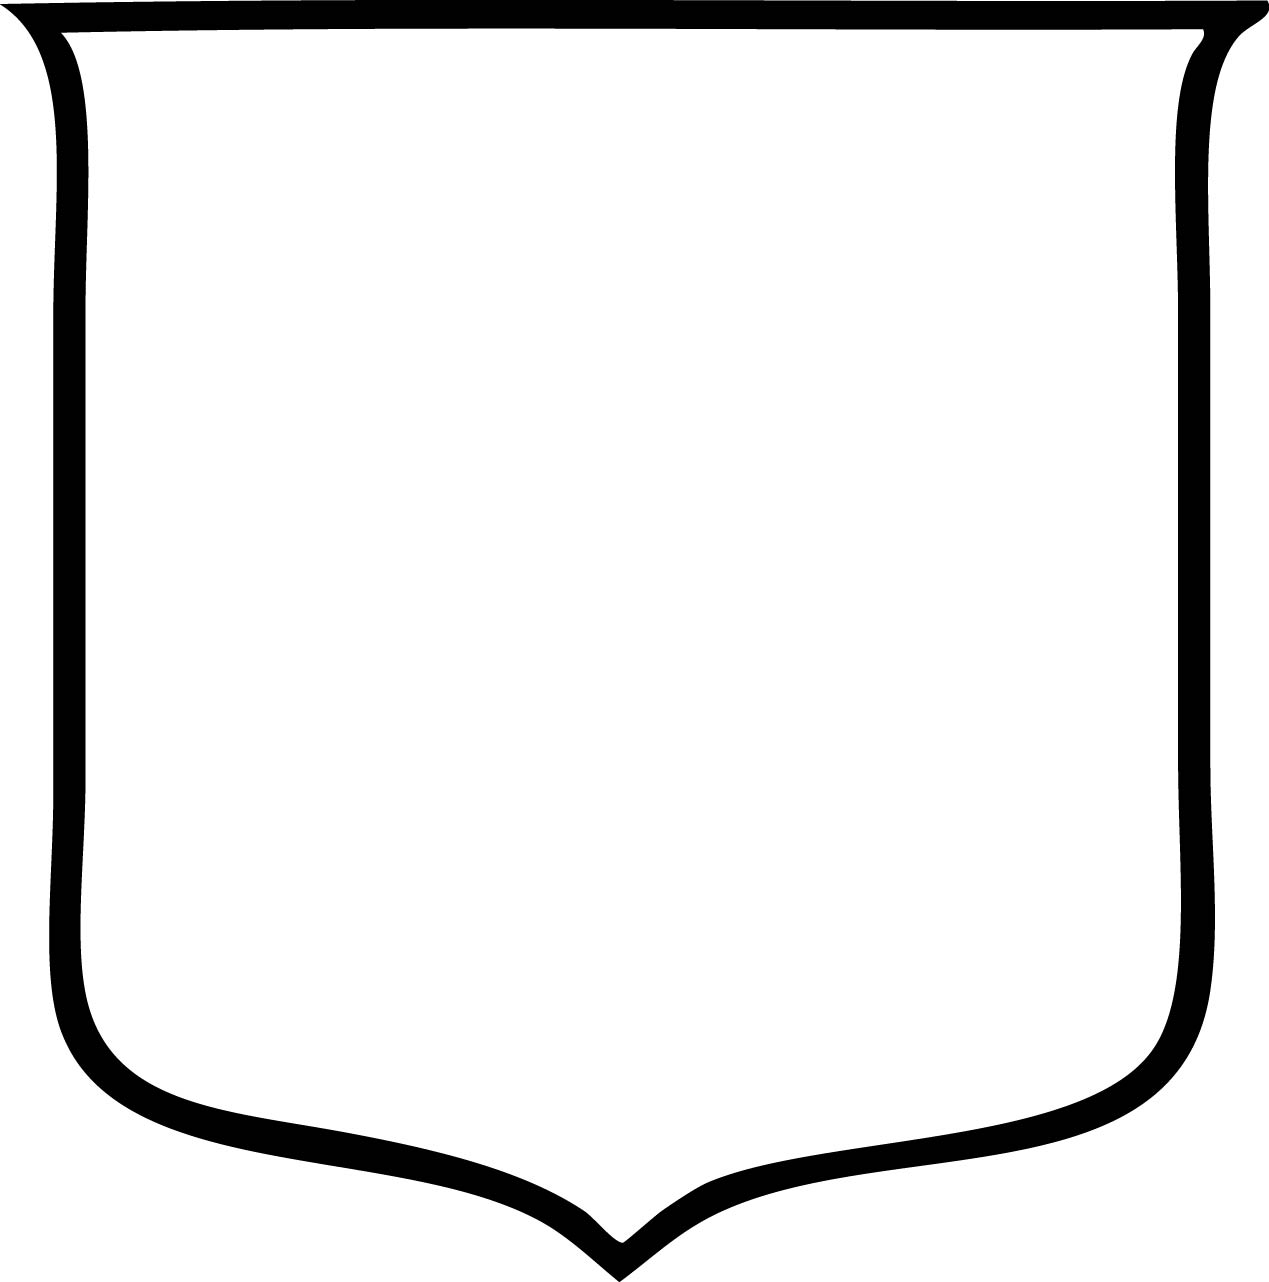 shield template